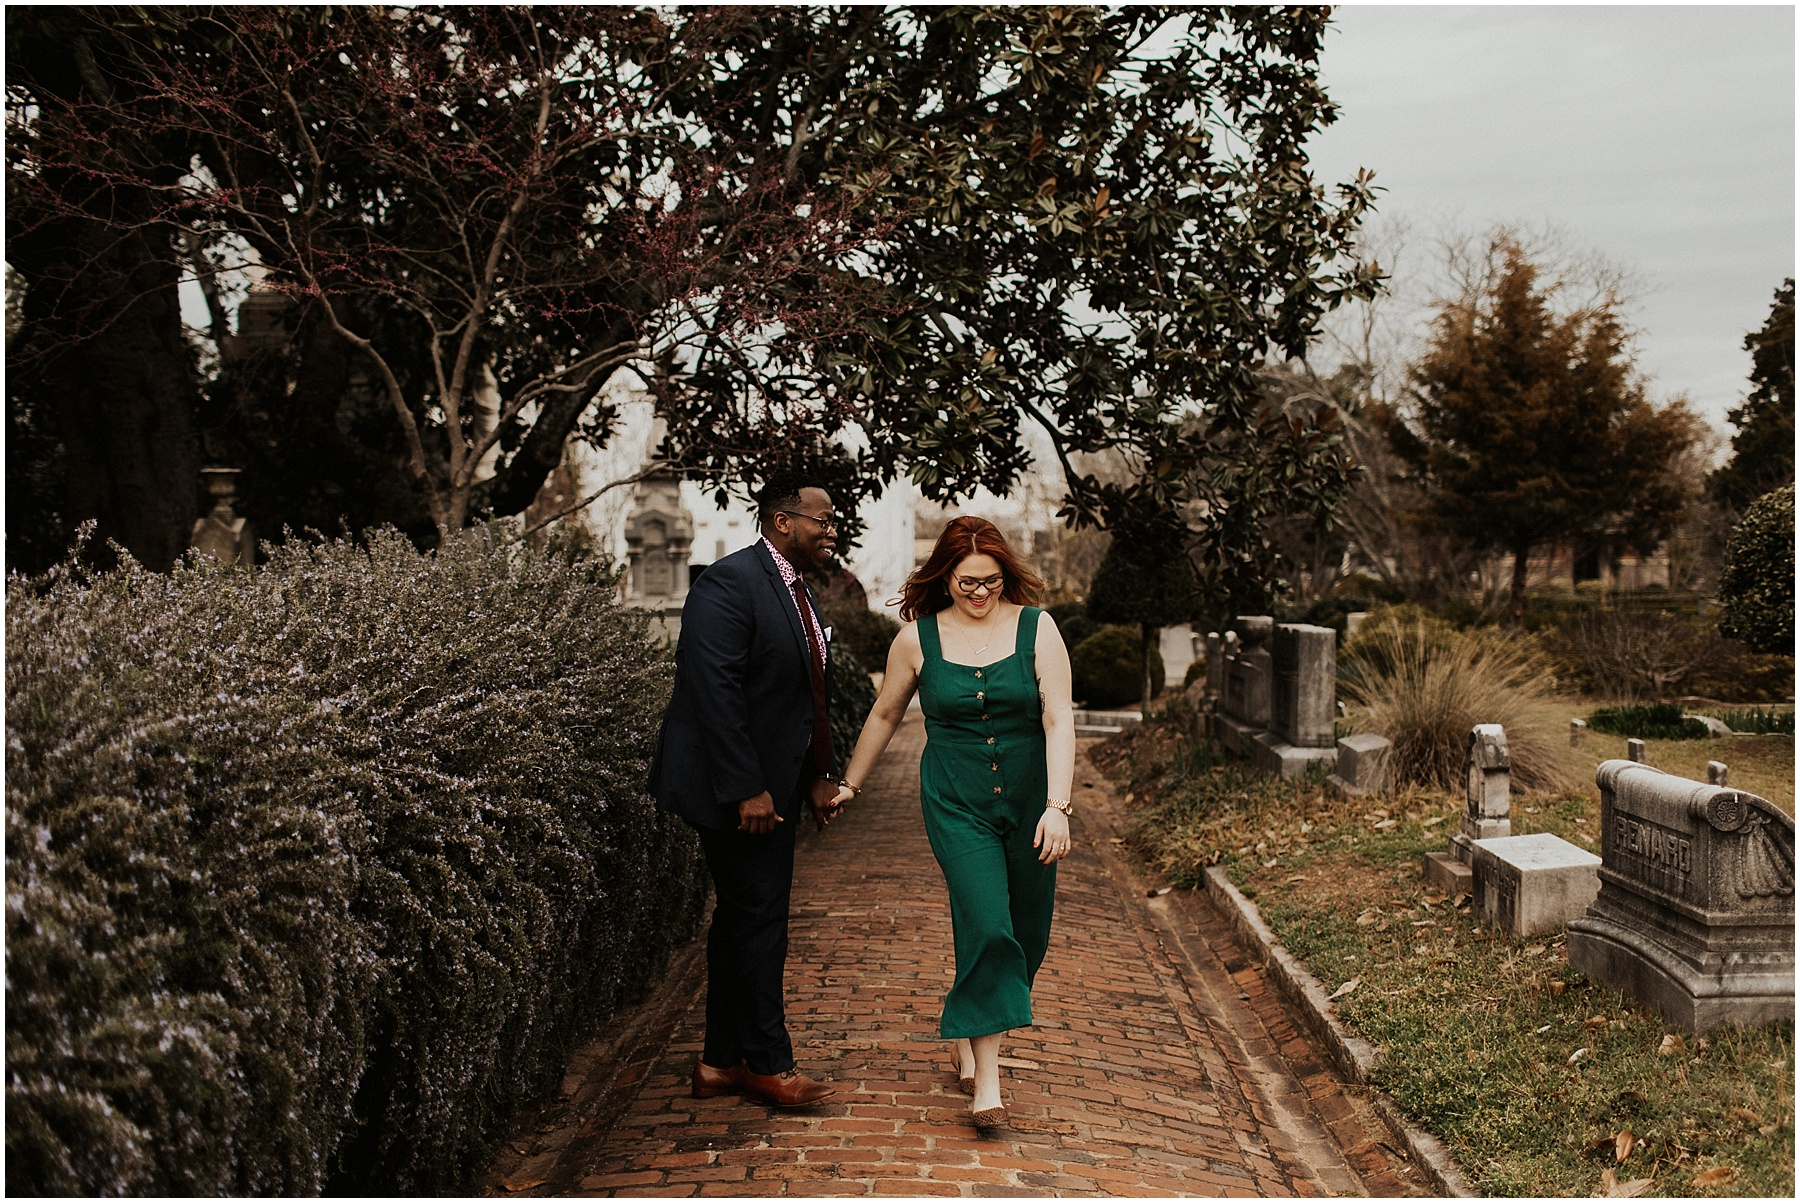 Oakland_Cemetery_Engagement_Atlanta010.JPG